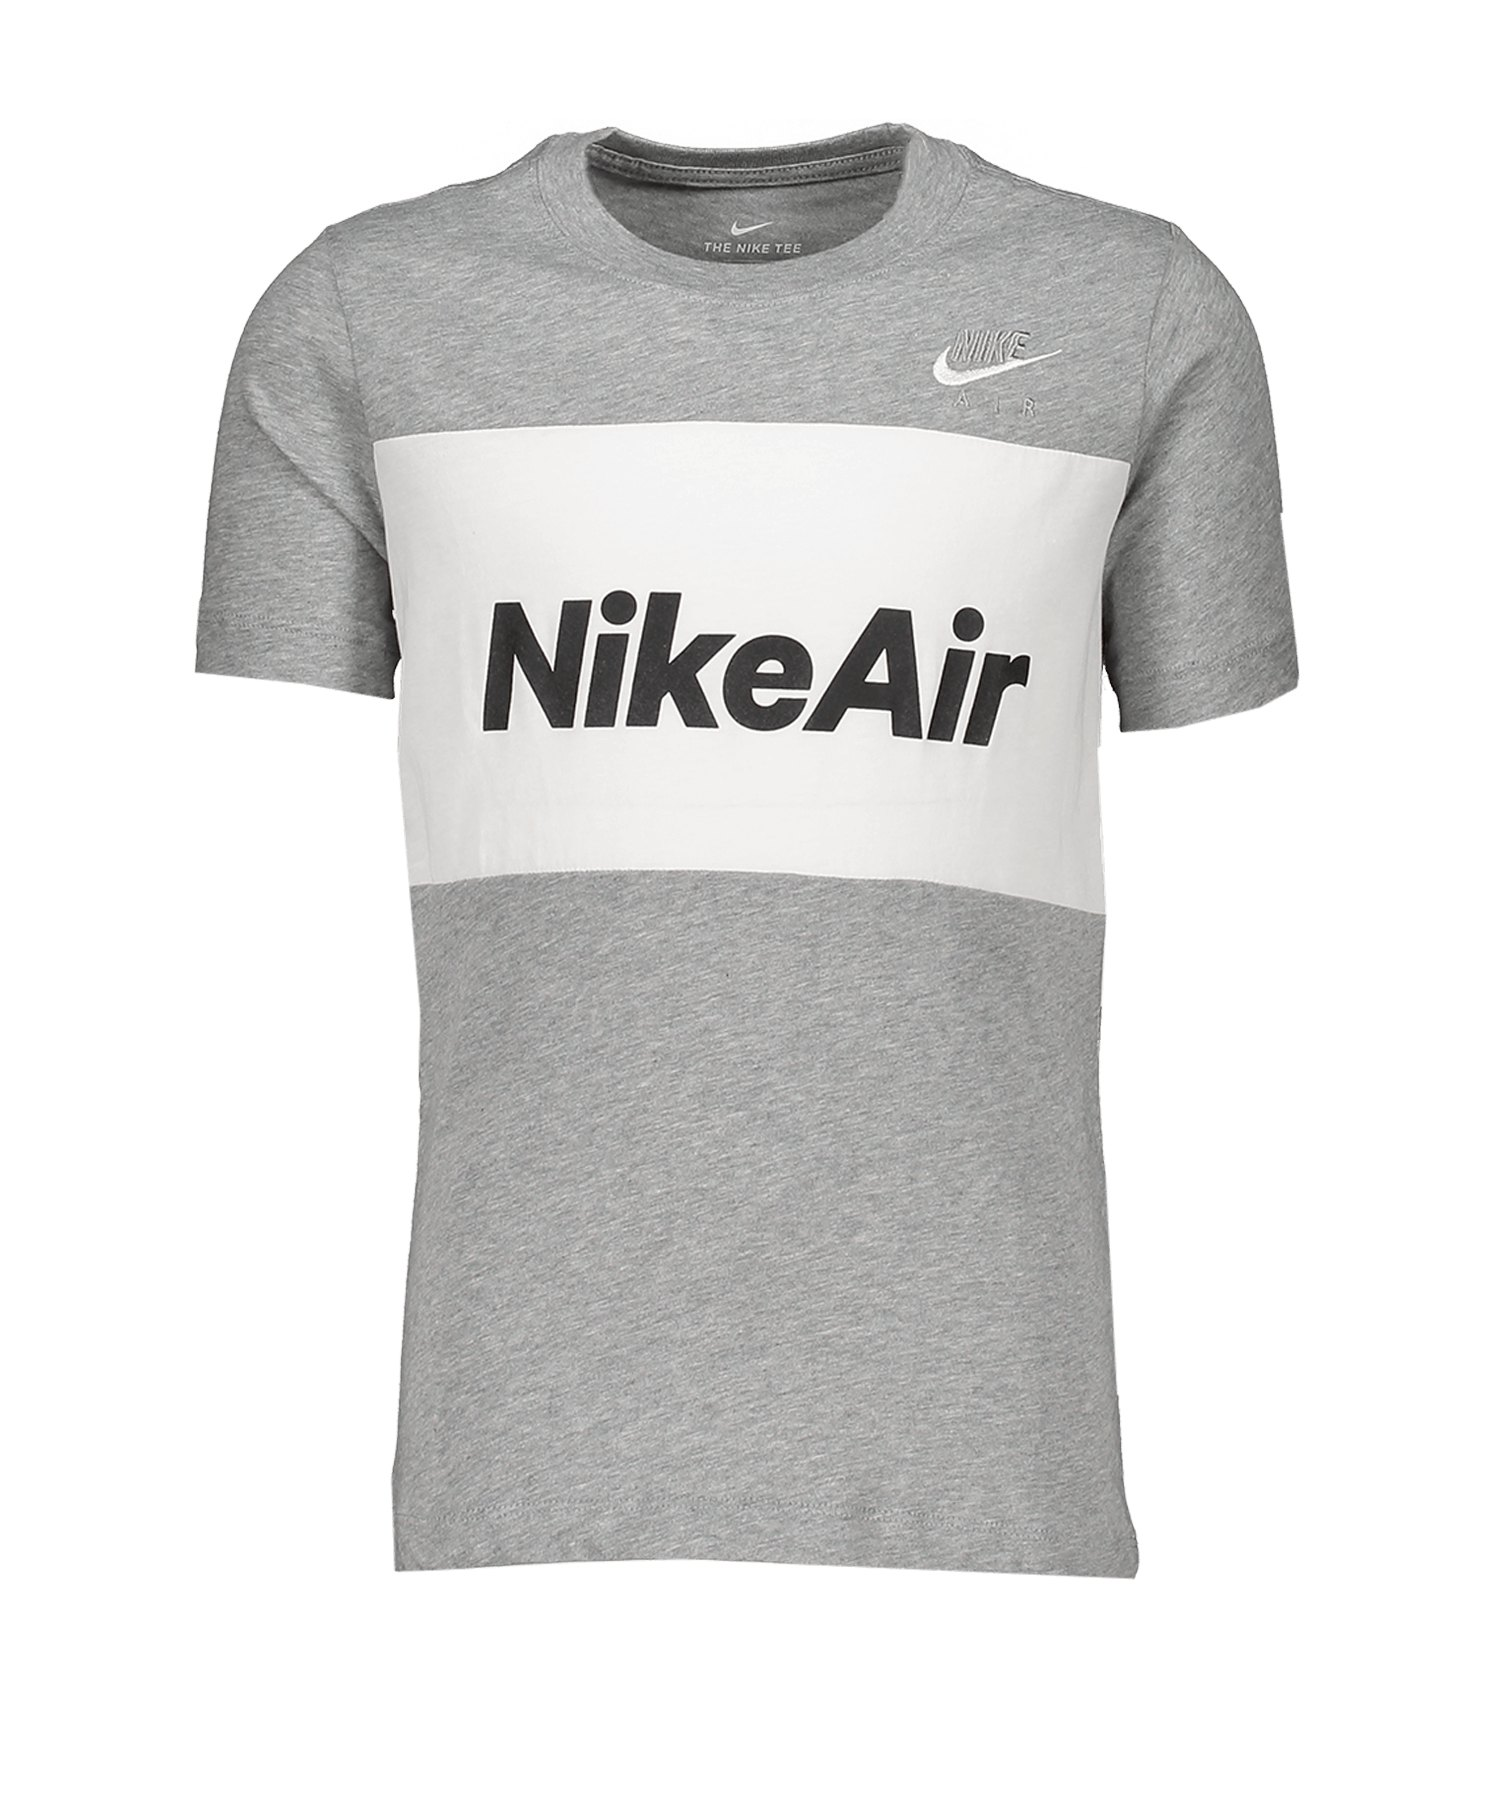 Nike Air Tee T-Shirt Kids Grau F063 - grau